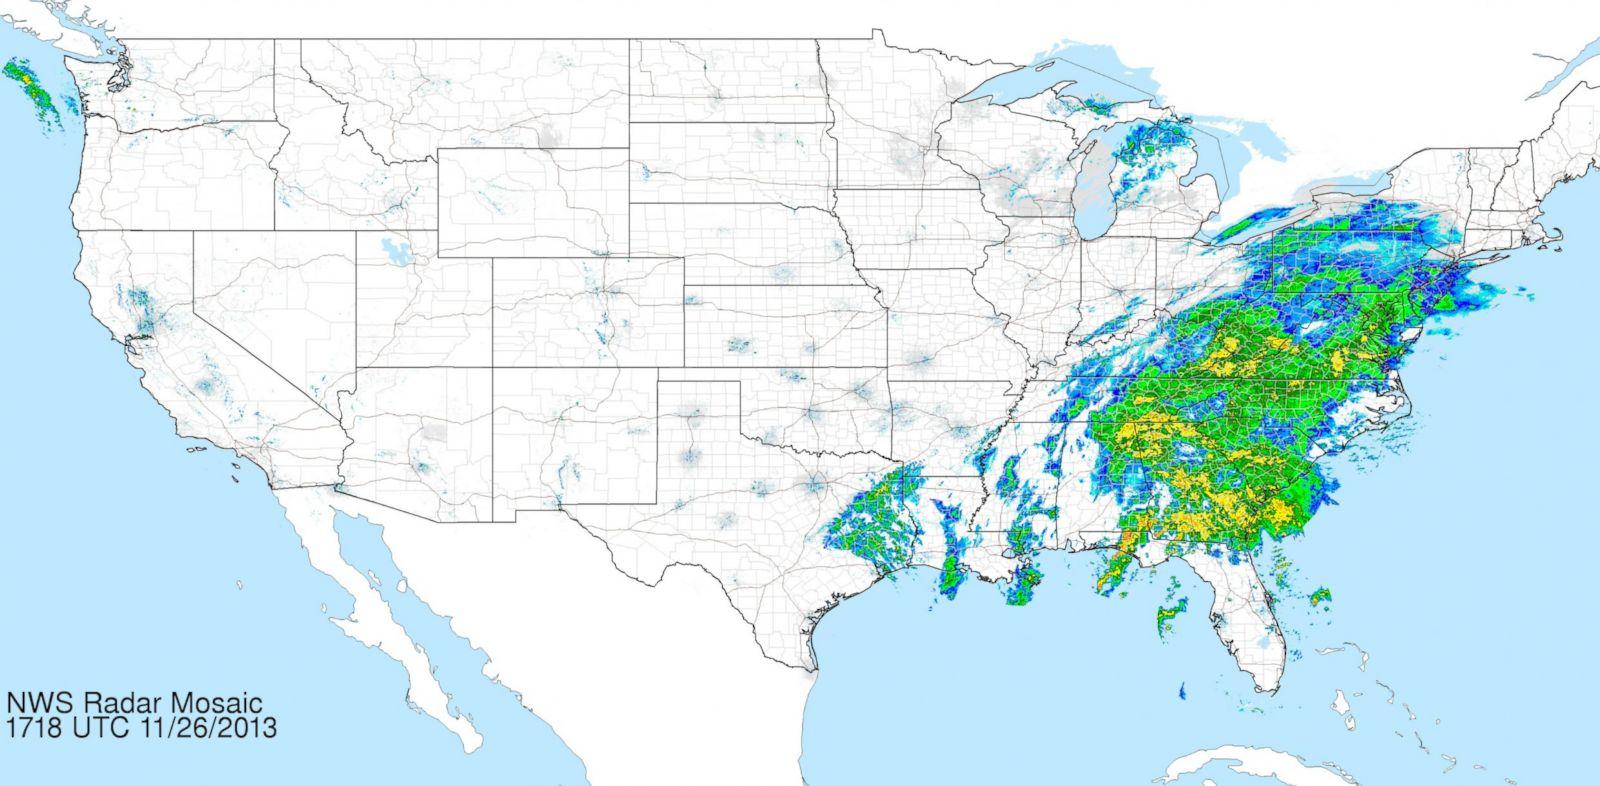 PHOTO: National Weather Service Radar Map